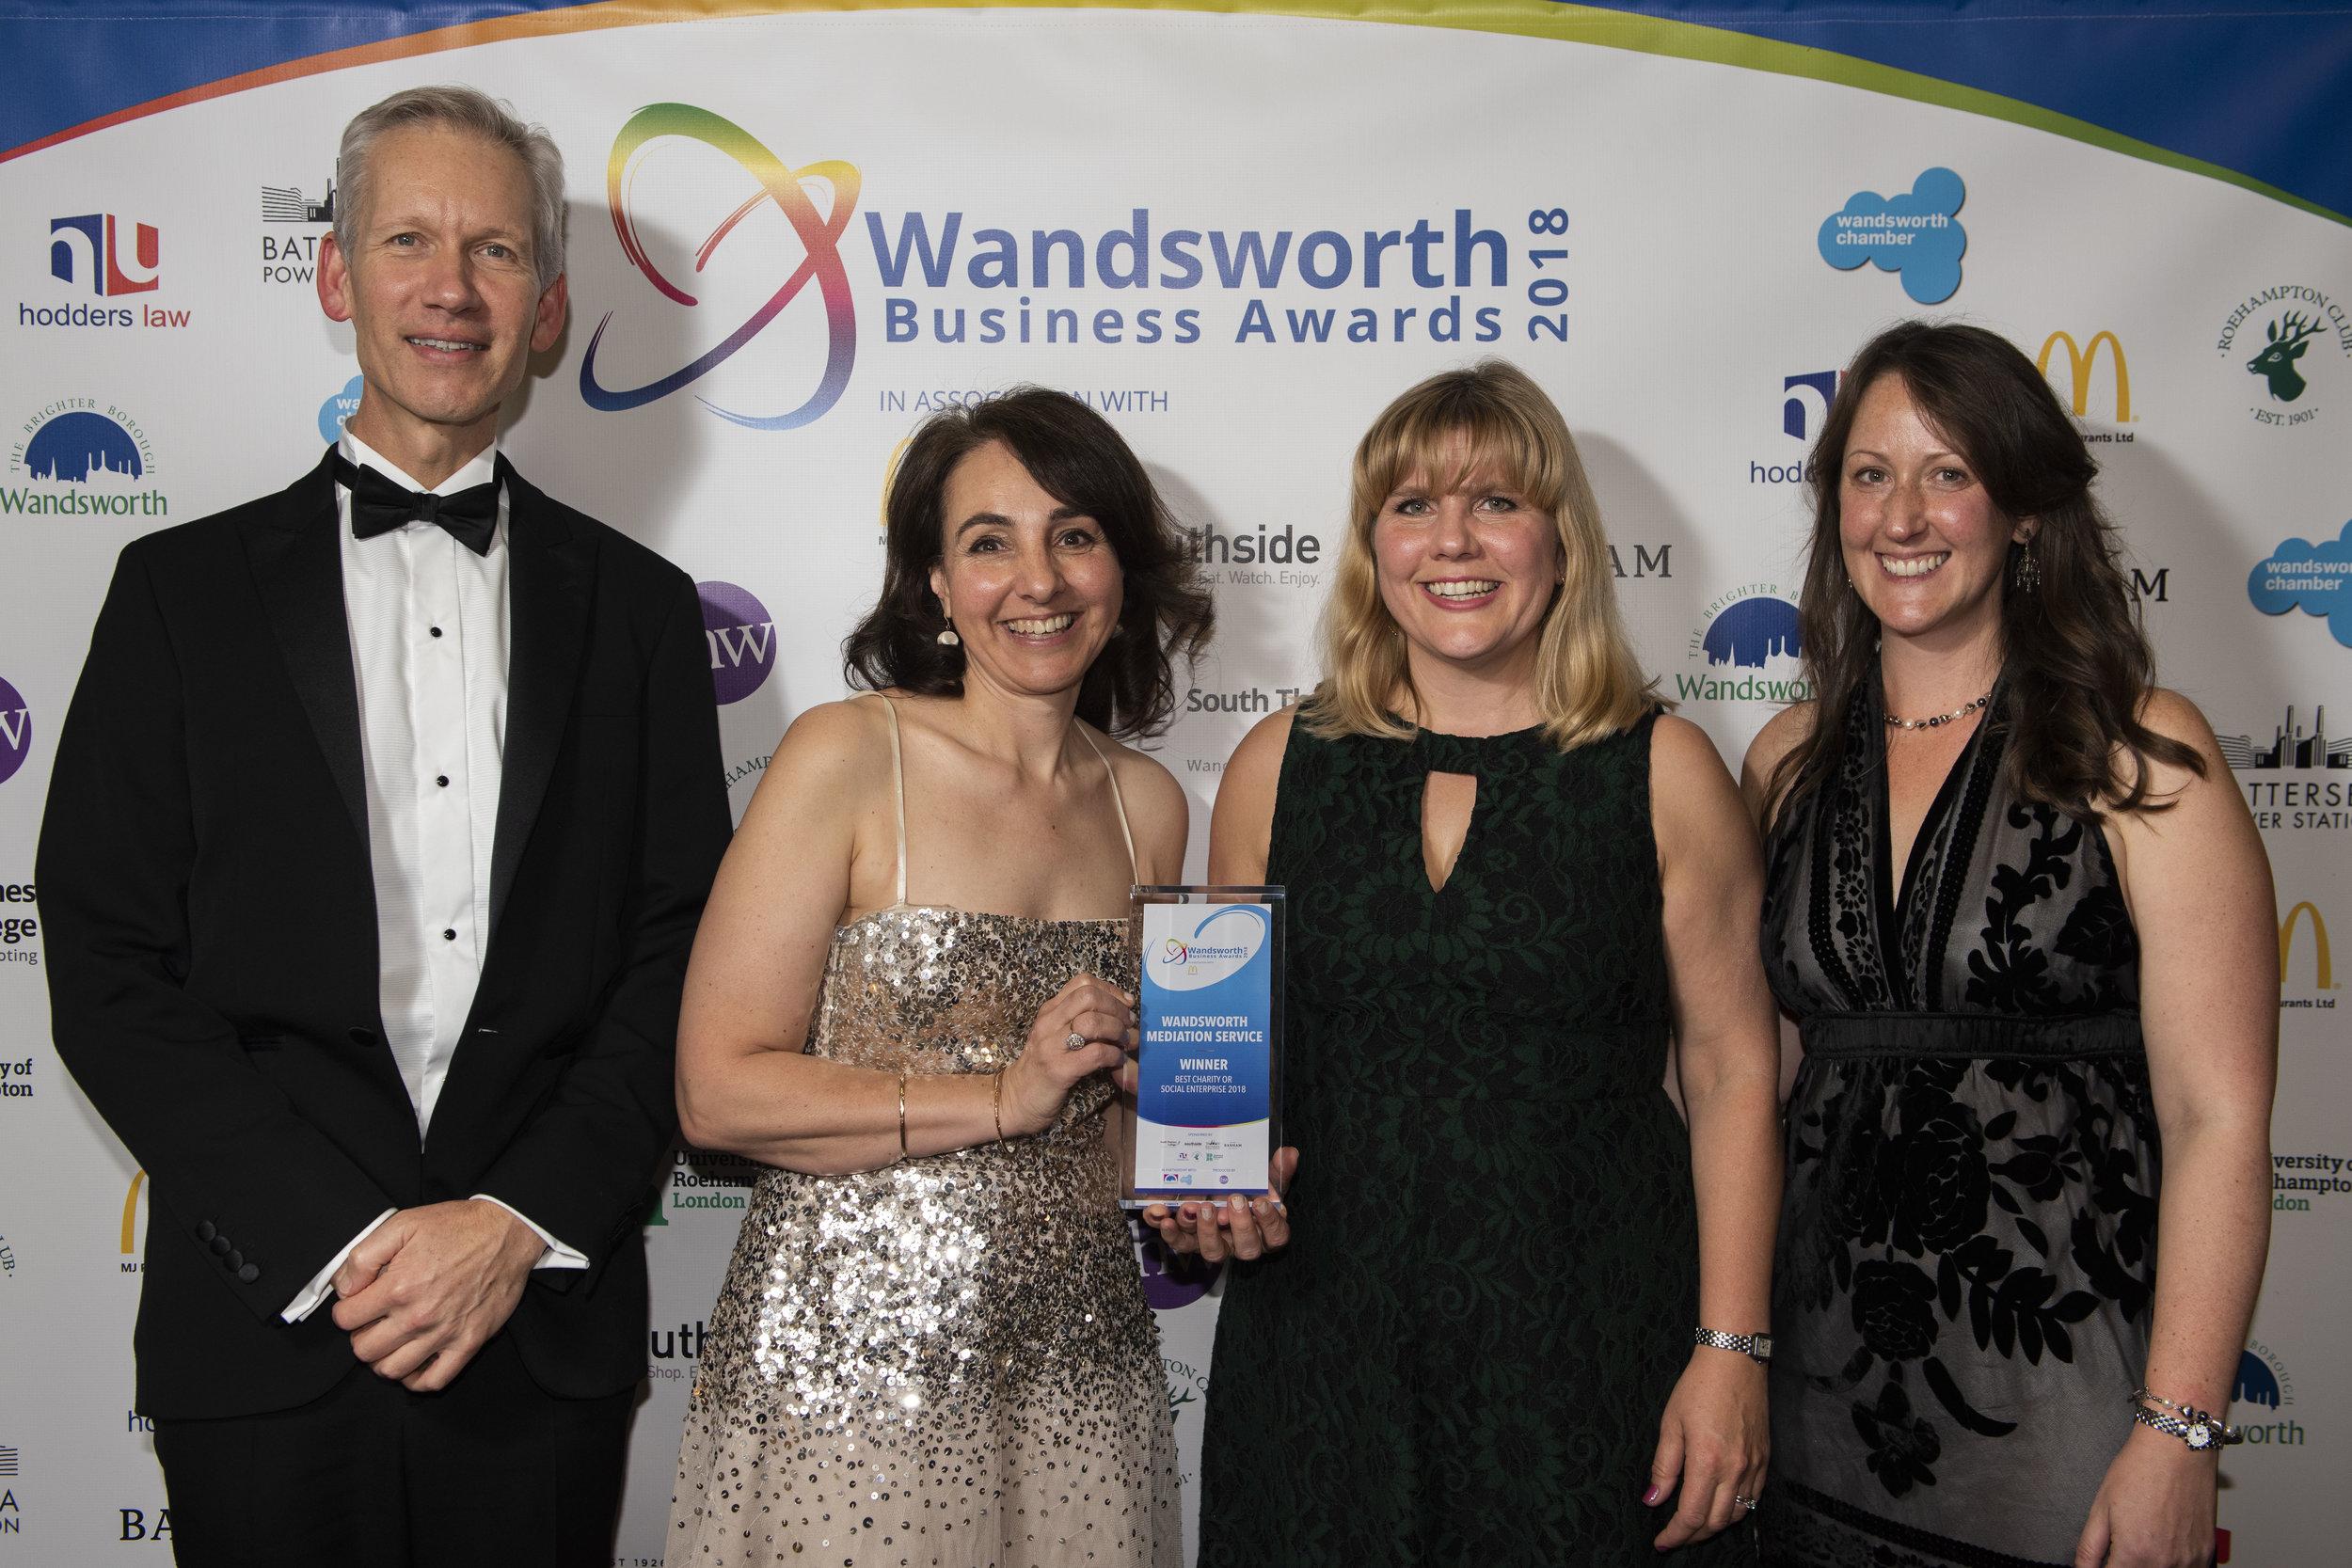 WANDSWORTH-WINNERS-2018_008 charity.jpg